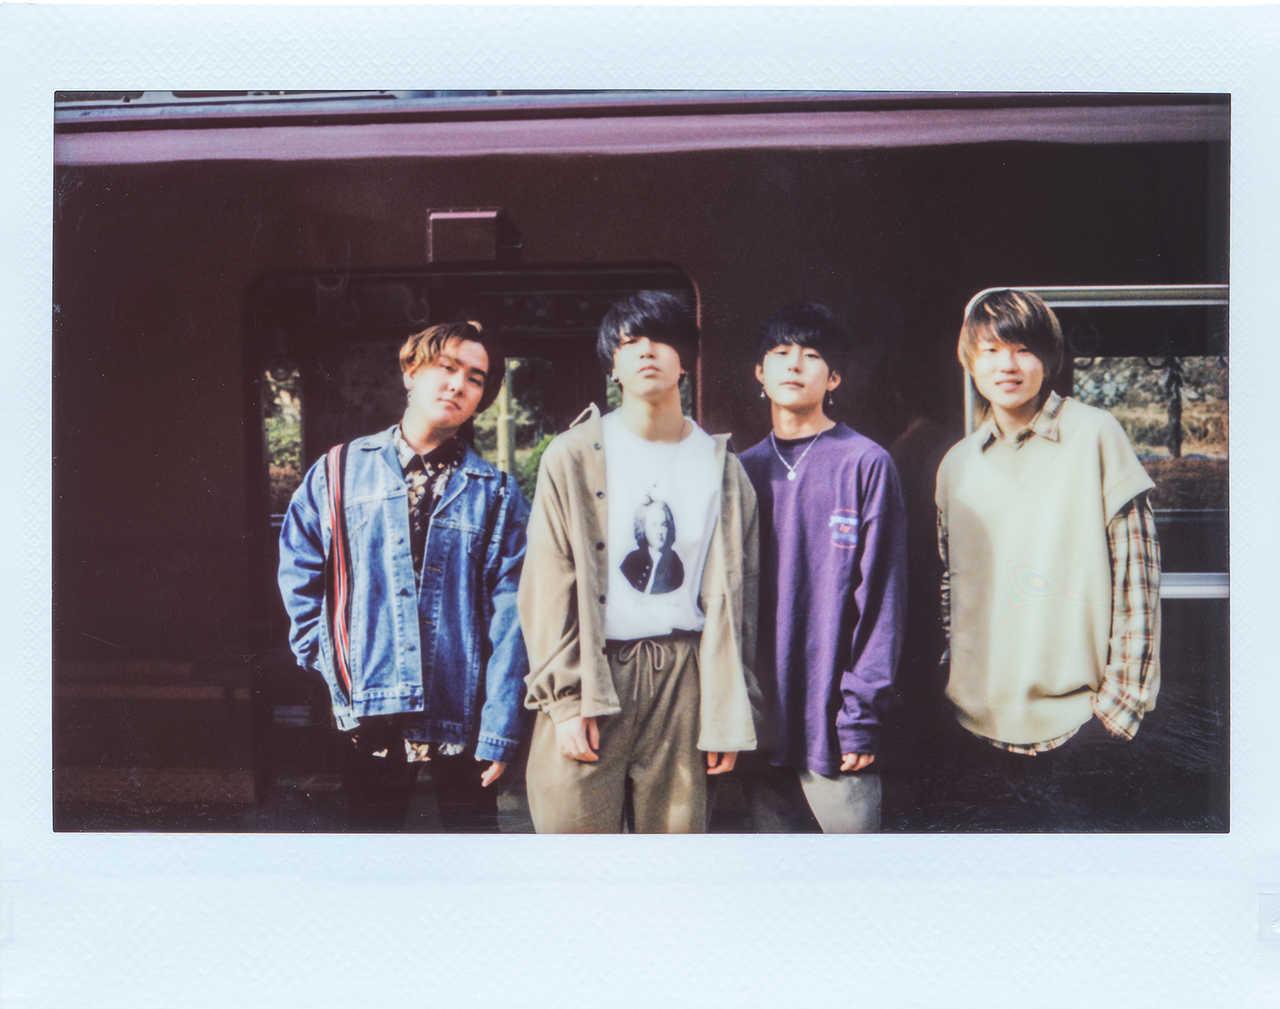 L→R 清弘陽哉(Dr)、汐田泰輝(Vo&Gu)、岩橋茅津(Gu)、中村龍人(Ba)